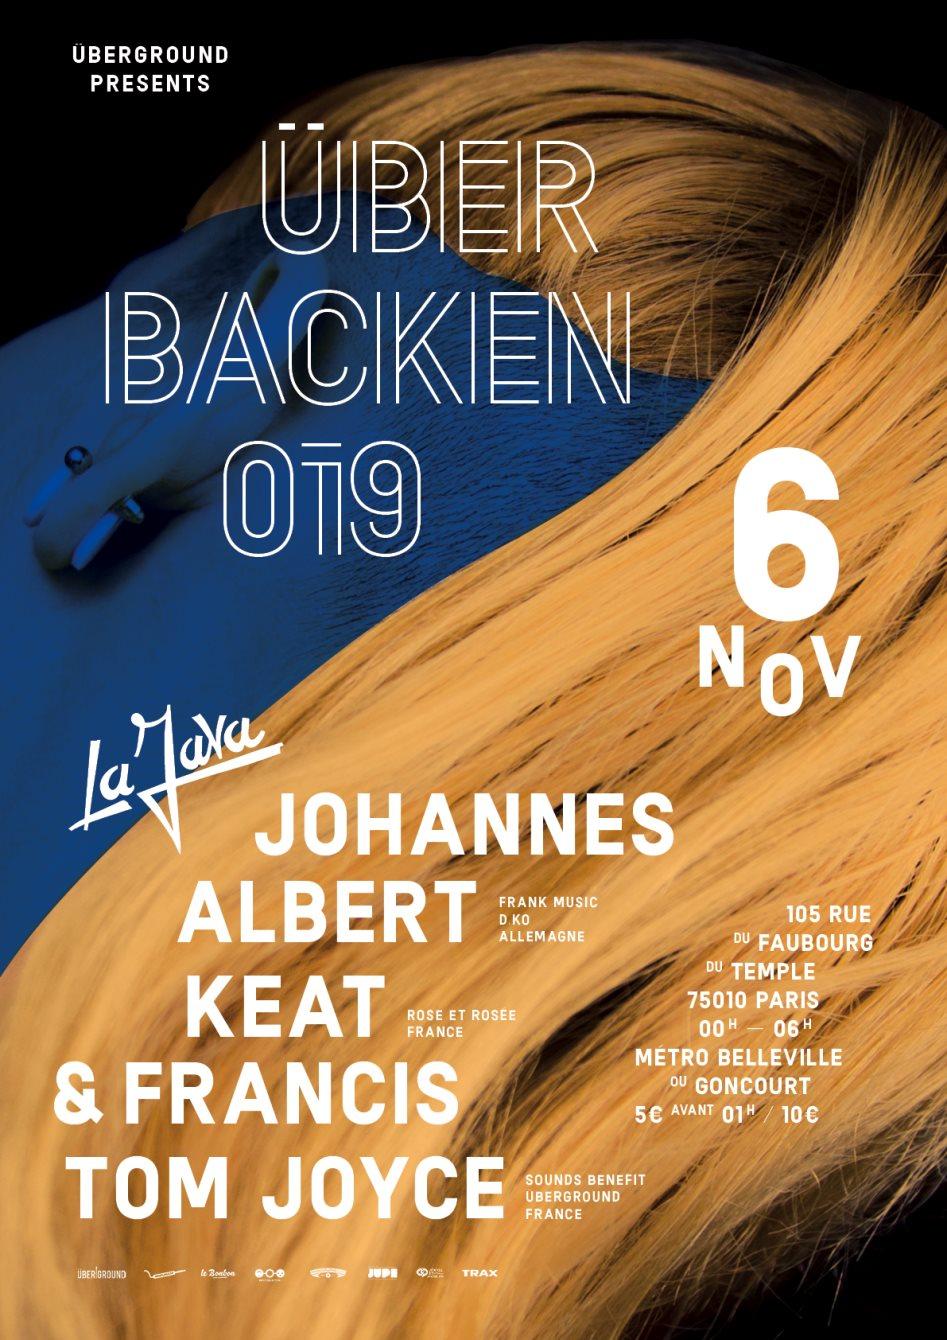 RA: Überbacken 019 with Johannes Albert, Rose et Rosée & Tom Joyce ...